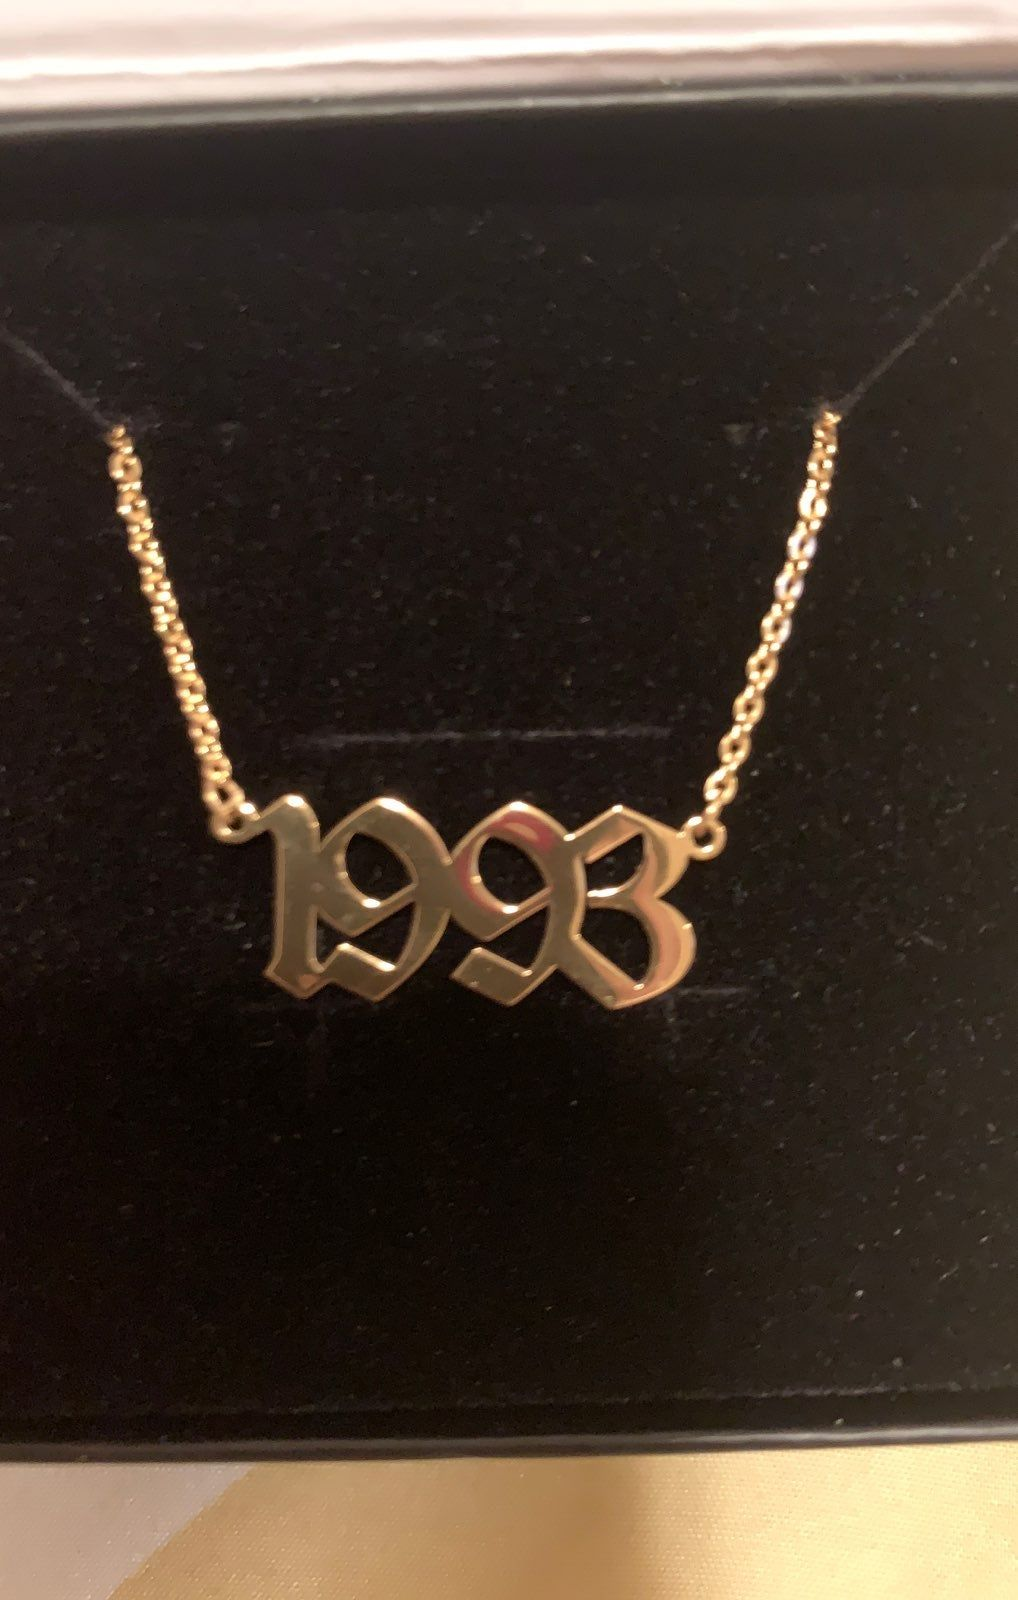 1993 Birth Year Custom Necklace 18 Chain Gold New In Box 20 Obo Free Shipping Diamond Choker Necklace Necklace Diamond Choker